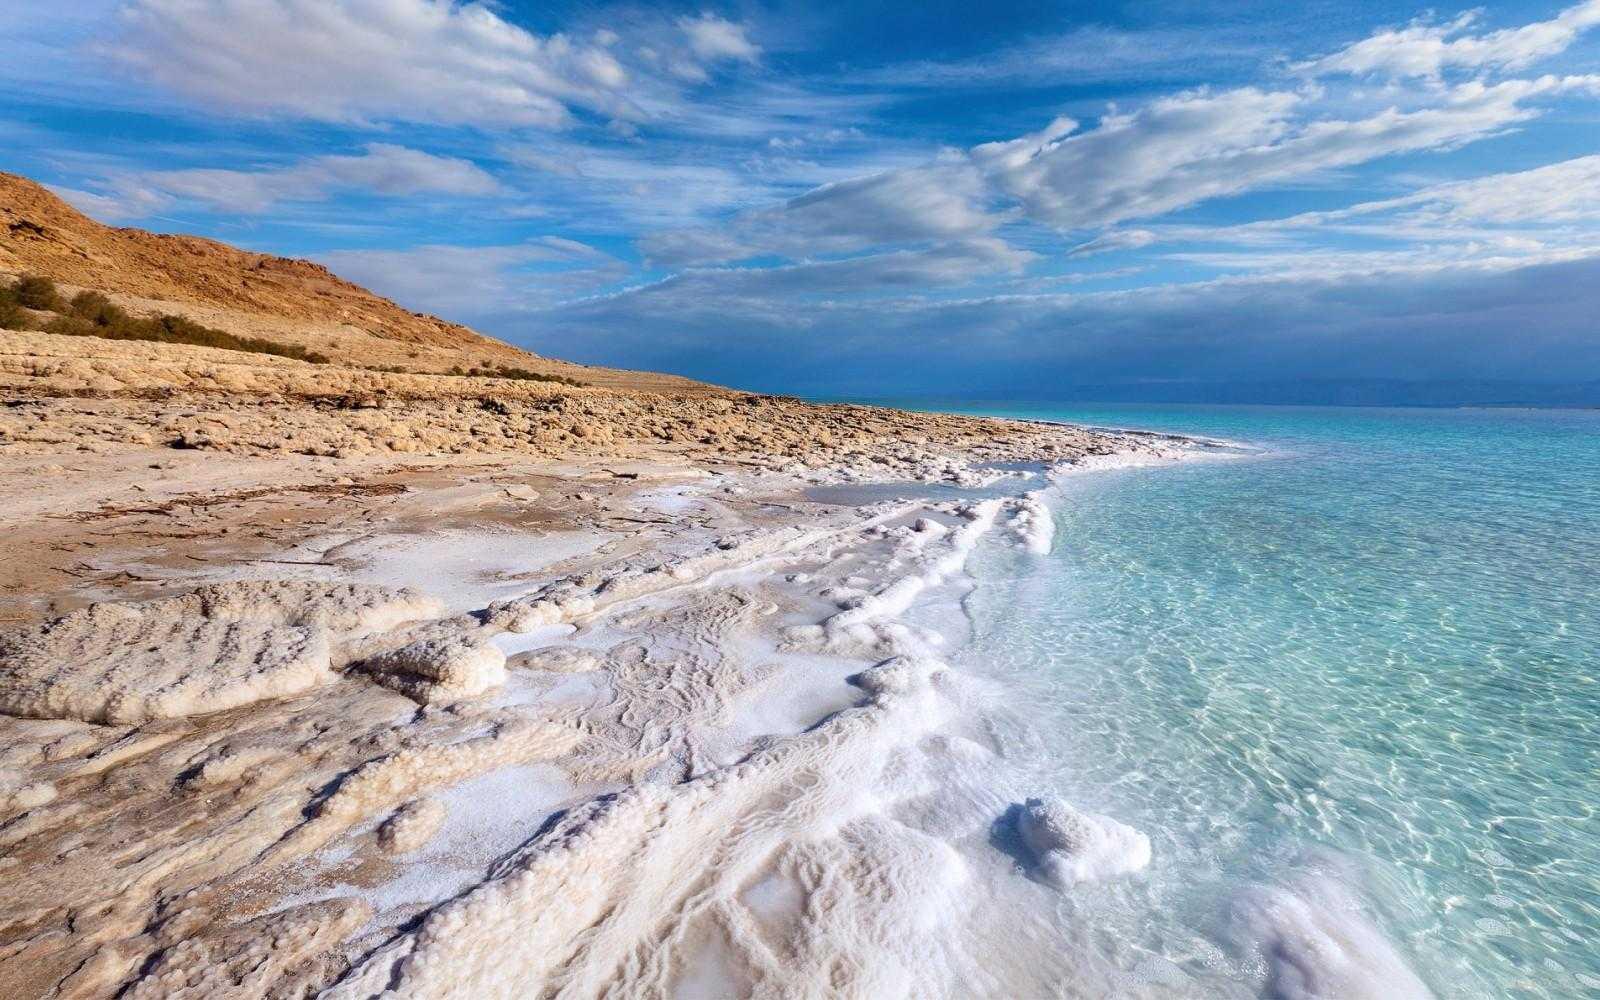 dead-sea-israel-wallpaper-4xdgg3c